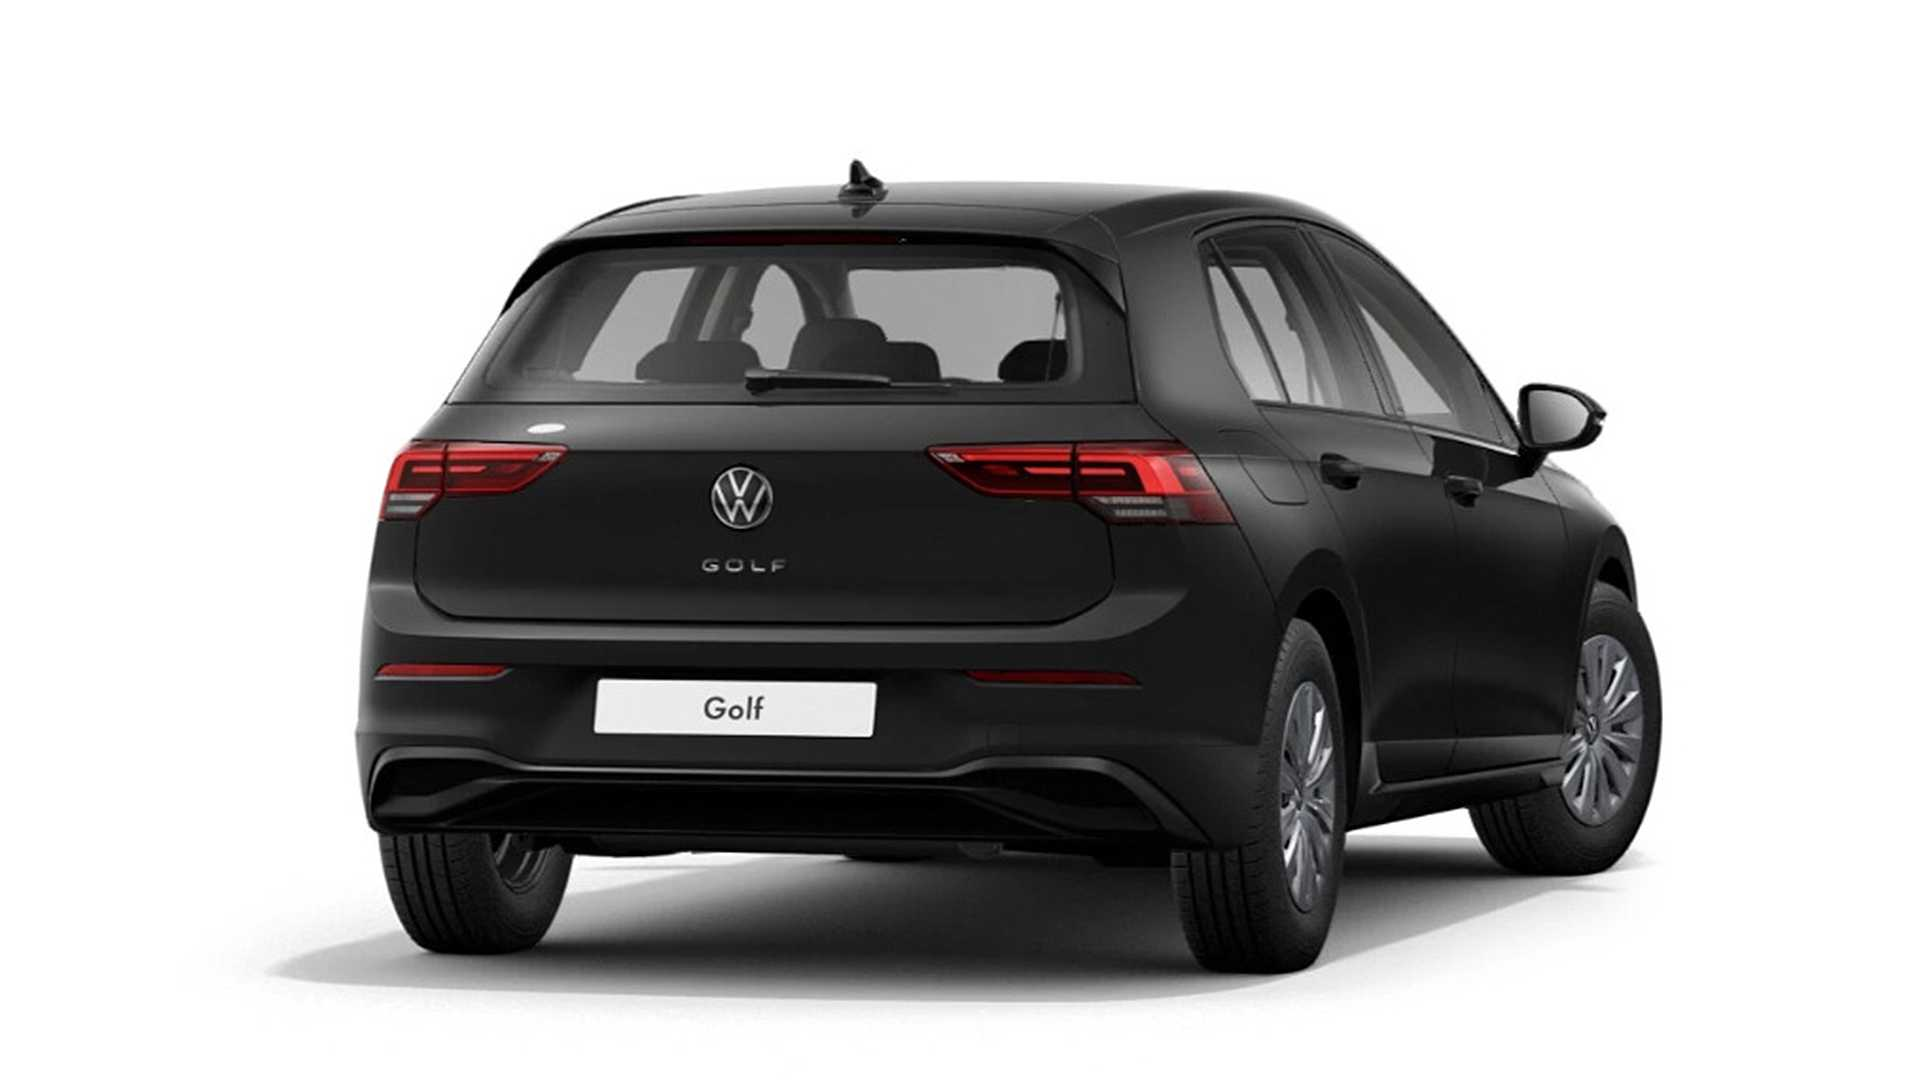 Volkswagen-Golf-2020-Base-Model-5